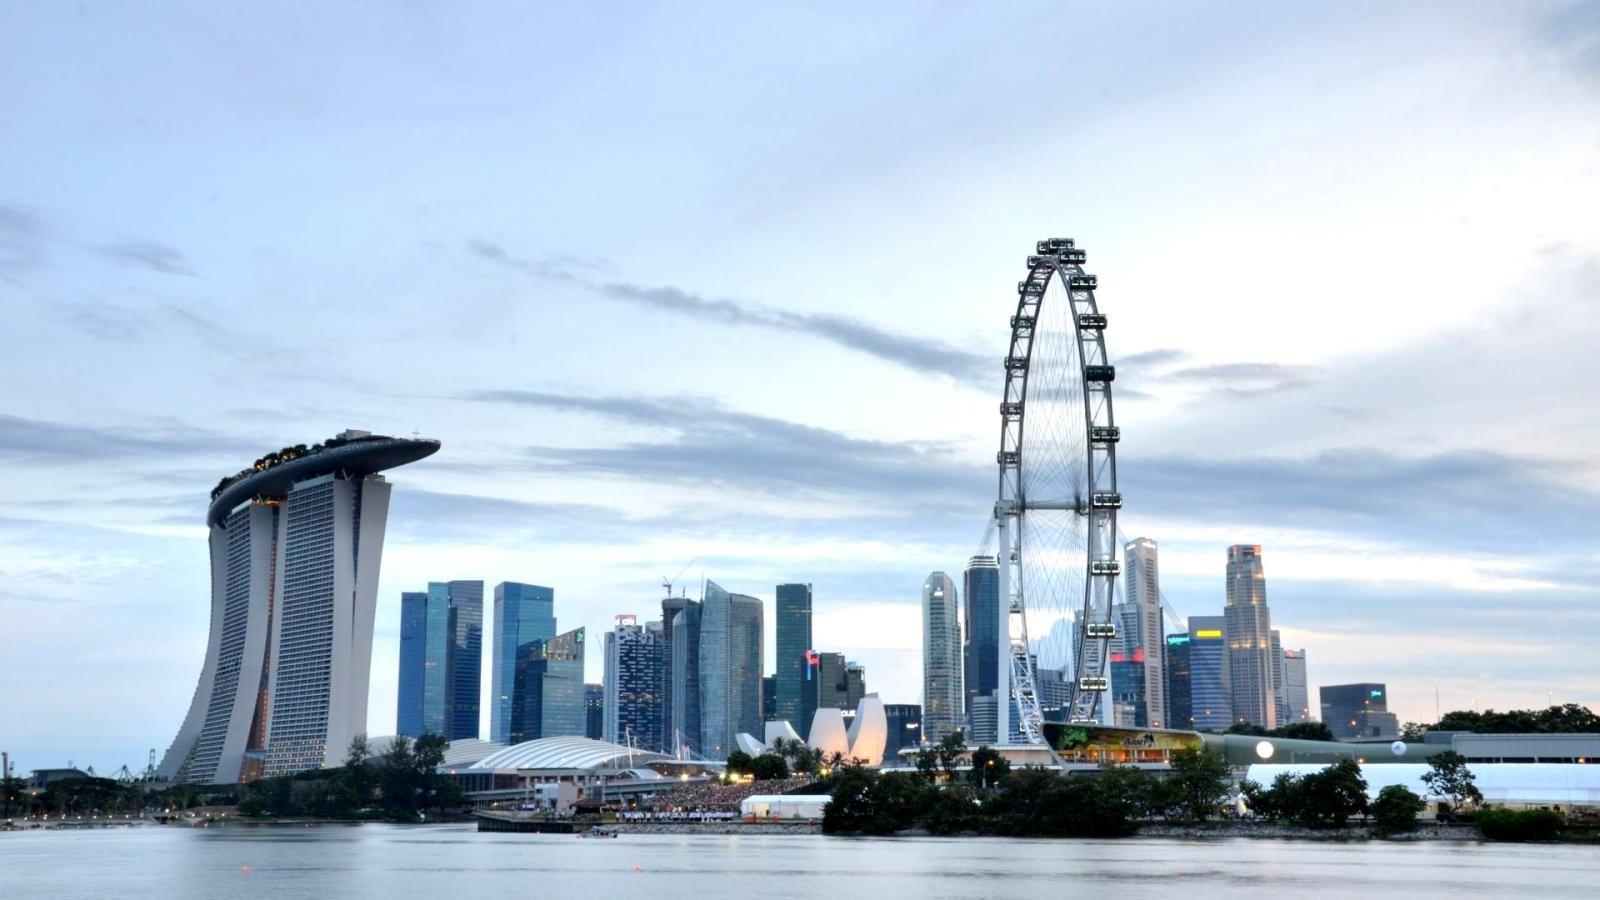 Panduan Mencari Dan Bekerja Di Singapura